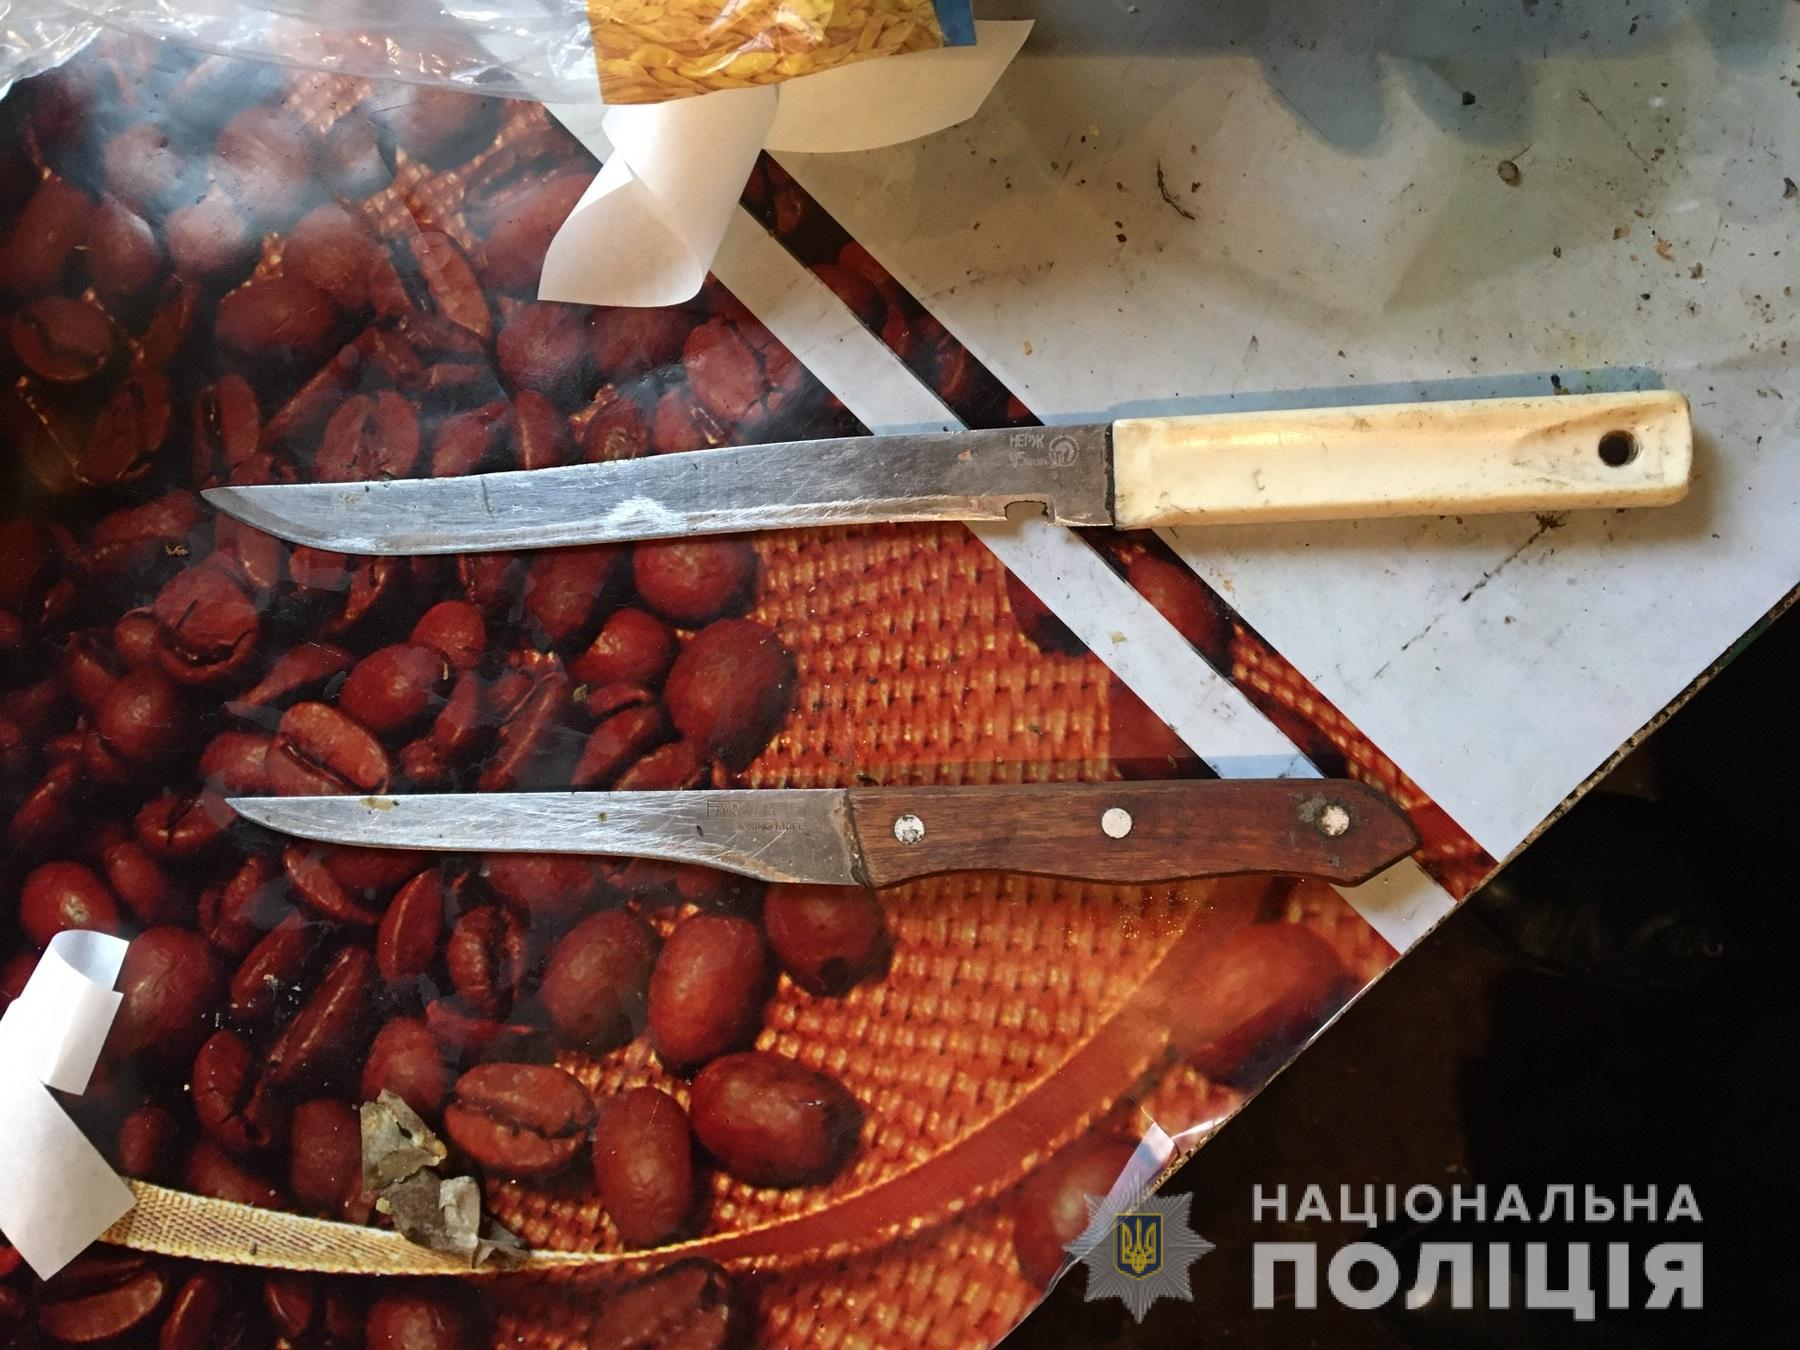 На Харьковщине мужчина вспорол соседу живот кухонным ножом